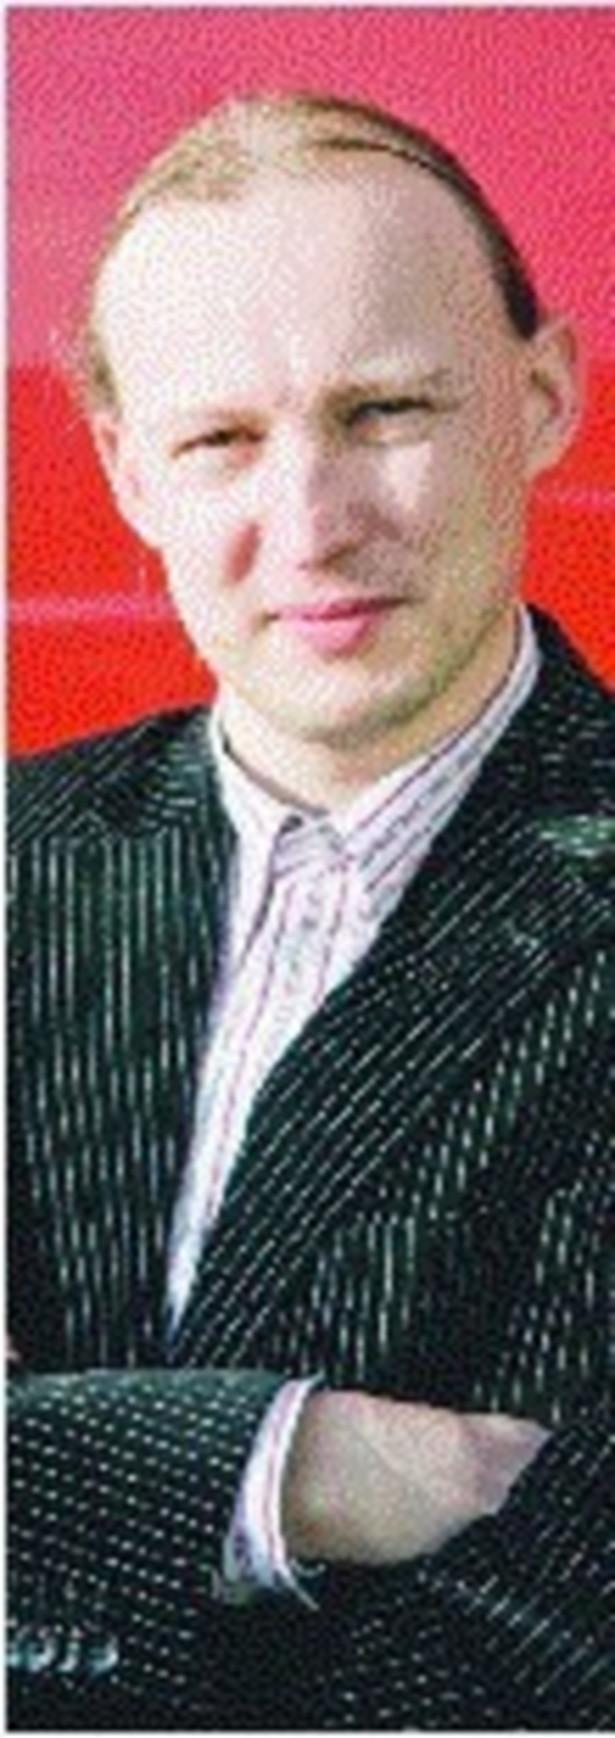 Daniel Kotyras, dyrektor ds. marketingu w NetArt Fot. Jacek Taran